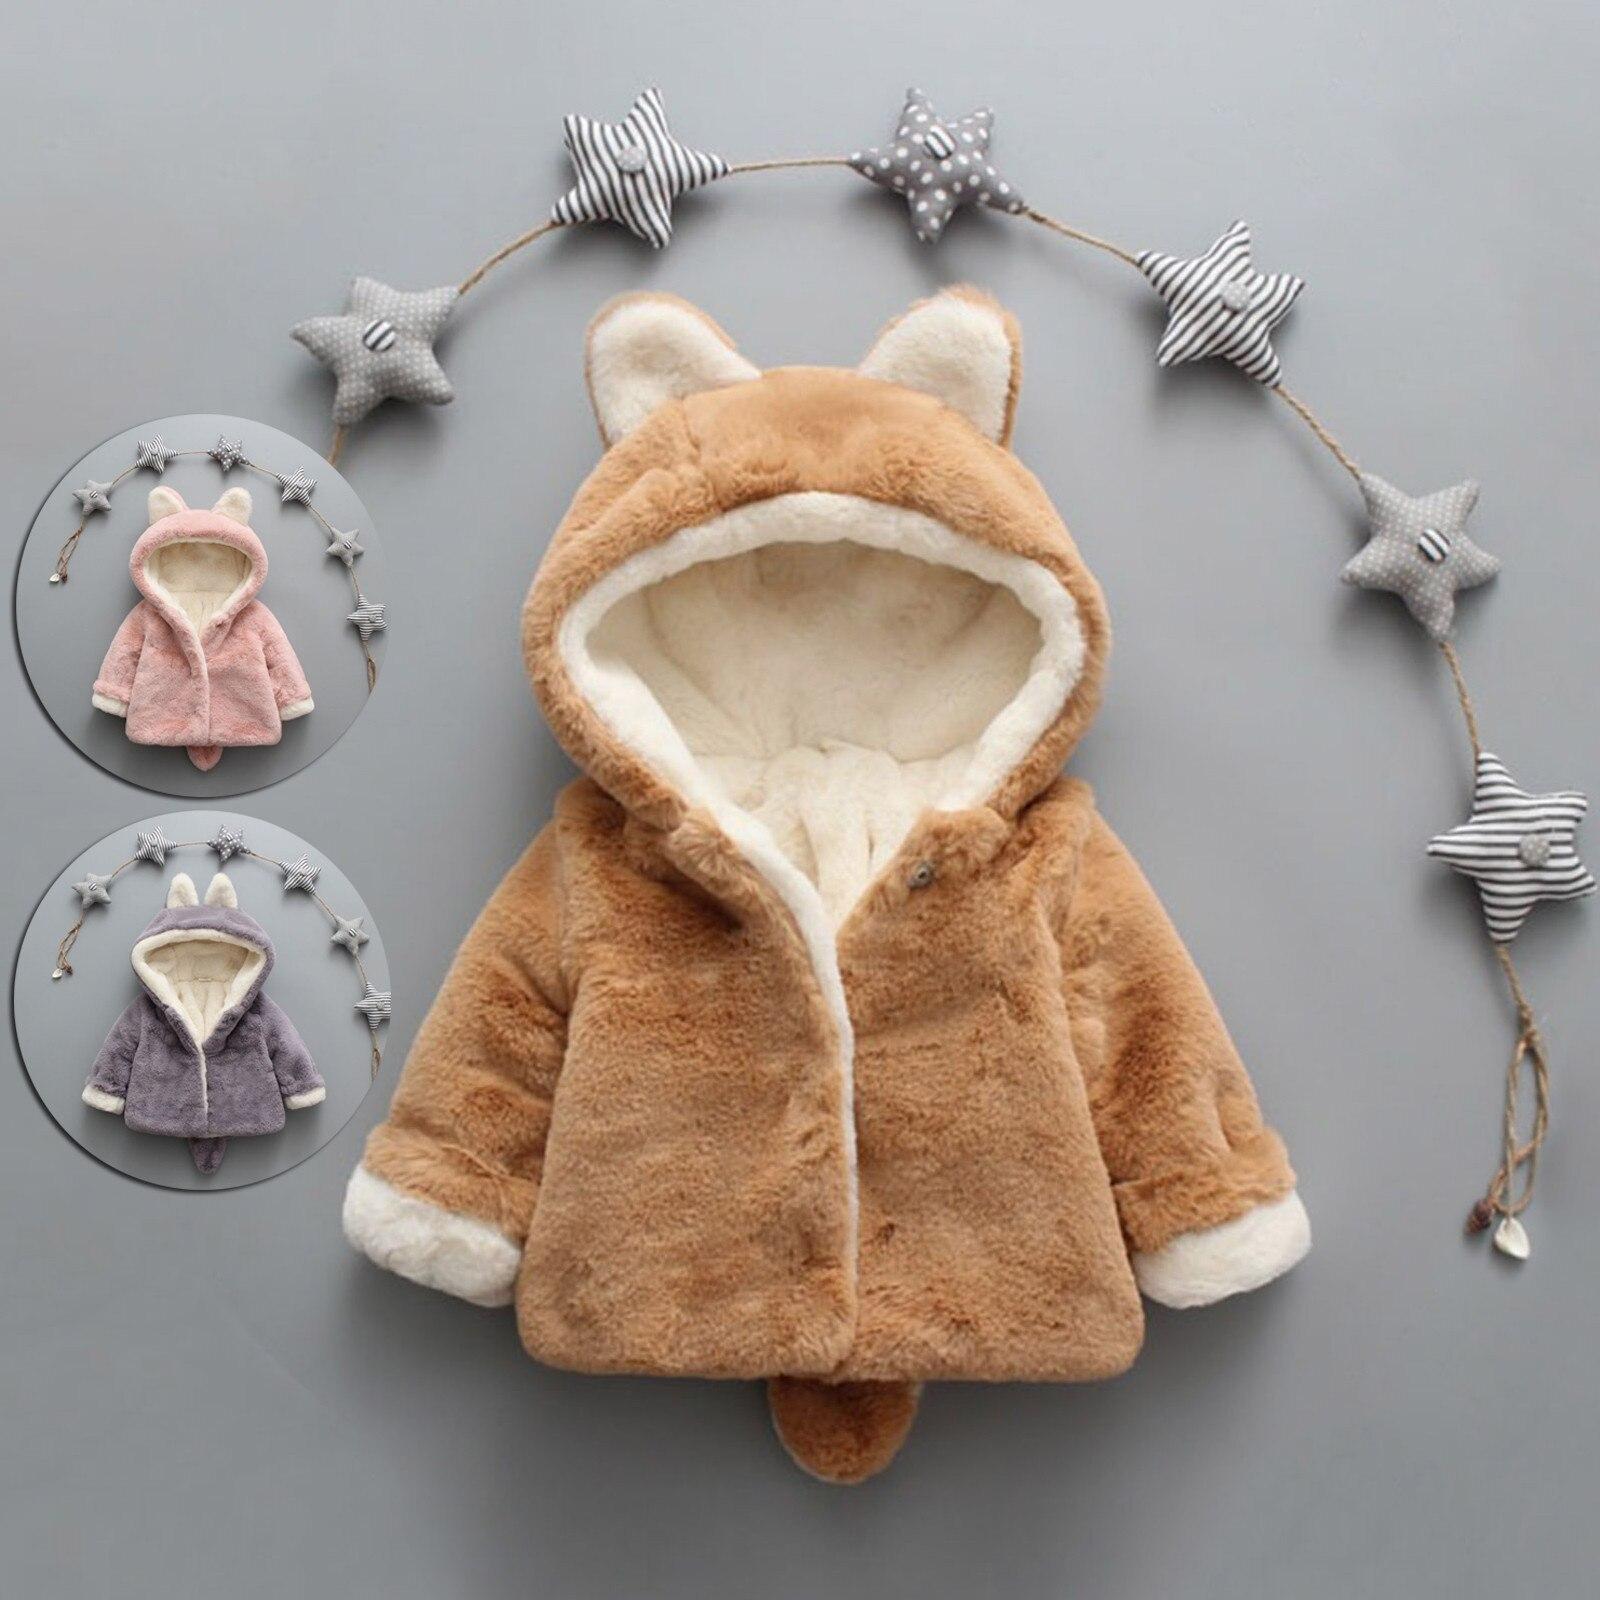 Jacket for girls Toddler Baby Boys Girls Fleece Windproof Winter Coat Thicken Warm Hoodie Outwear clothes for новорождëных